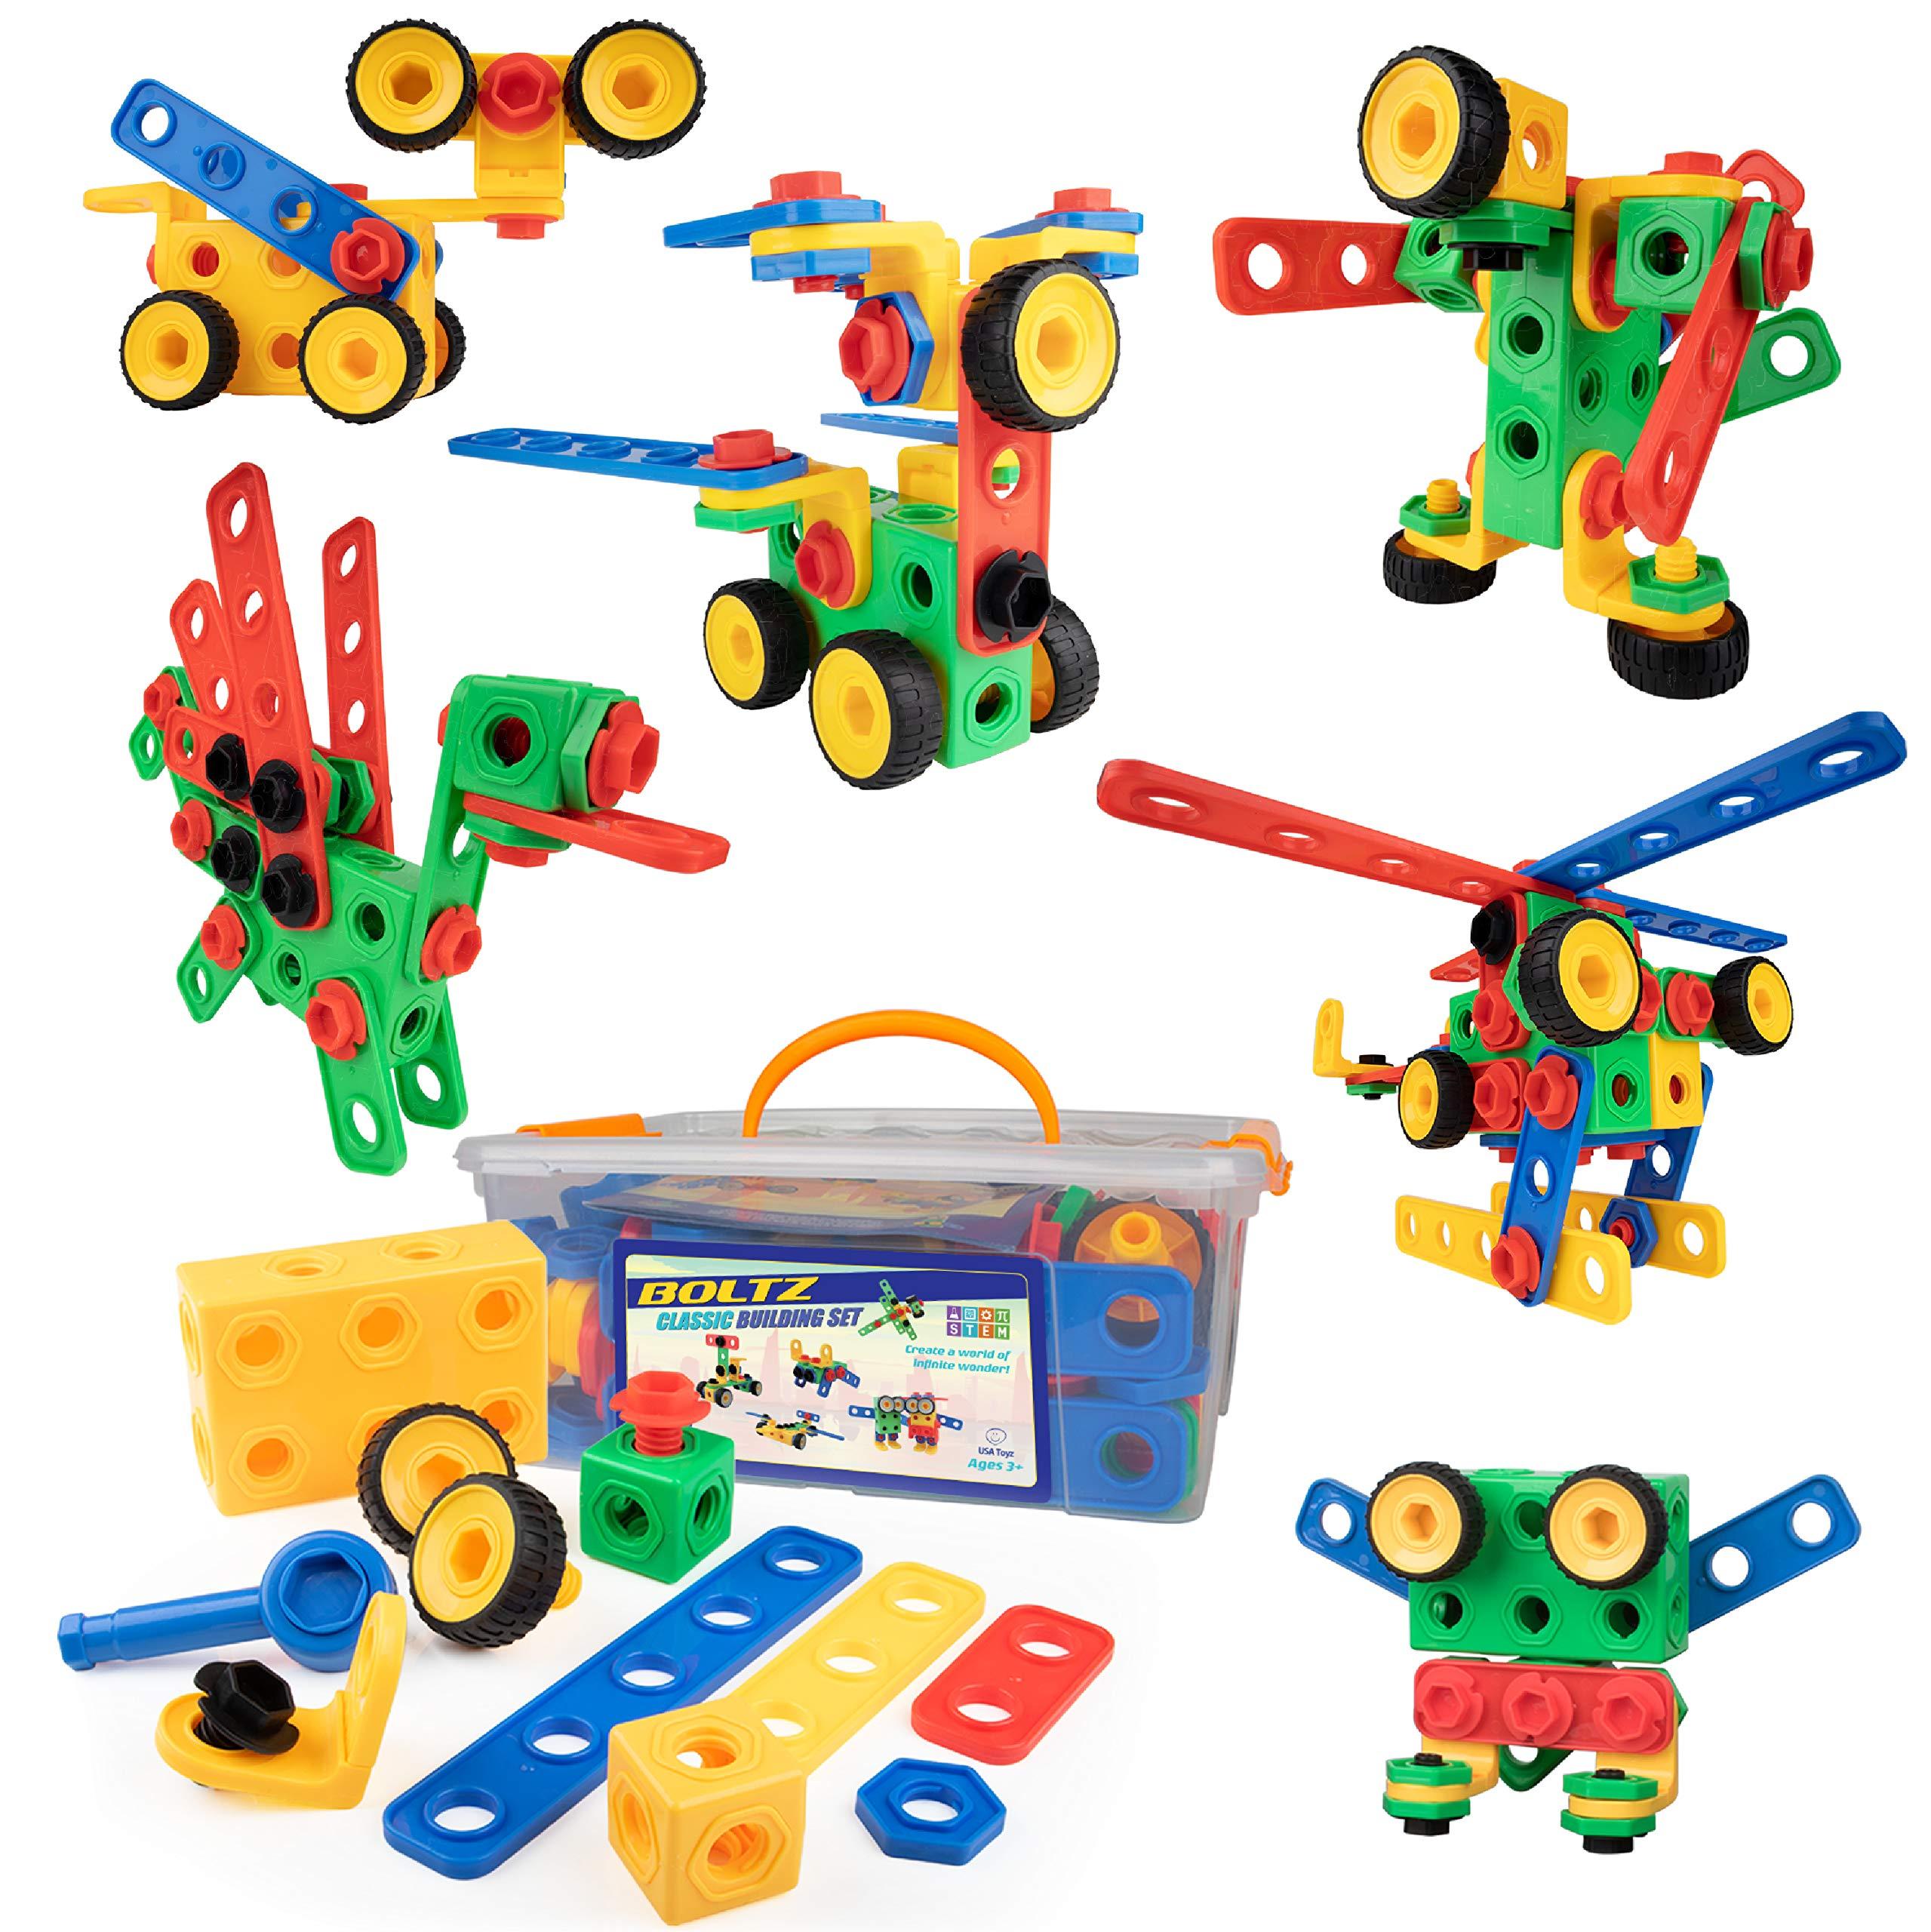 USA Toyz STEM Building Toys